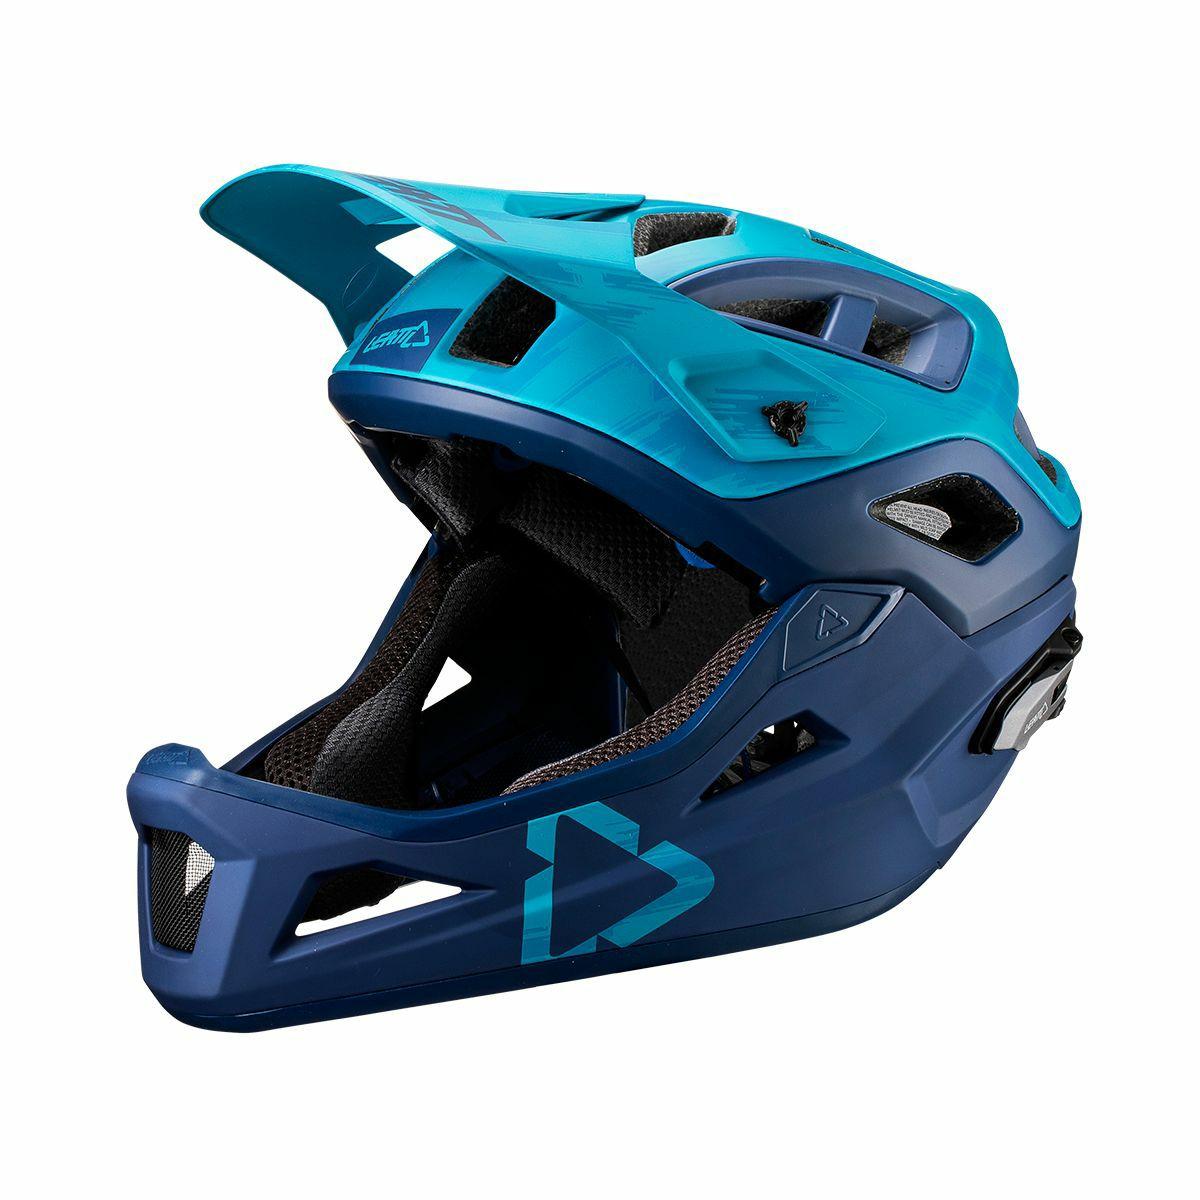 Leatt DBX 3.0 Enduro Mtb Helm Größe L / blau